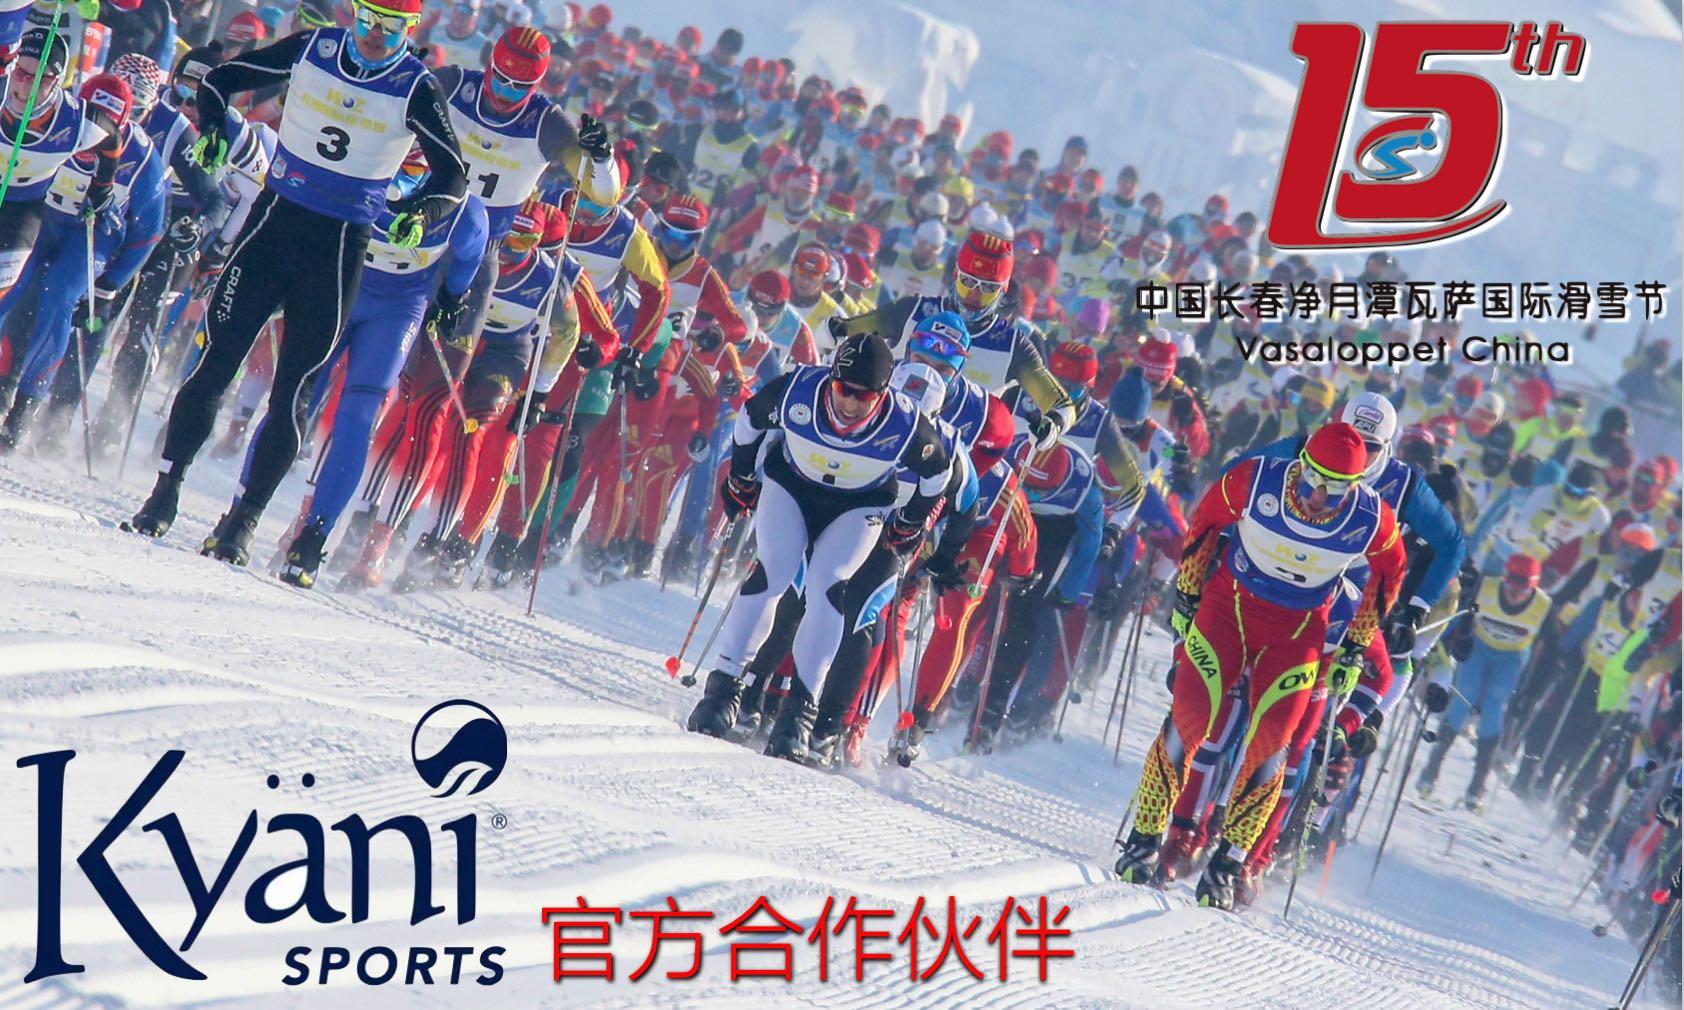 Vasaloppet China 2017 powered by Kyäni SPORTS